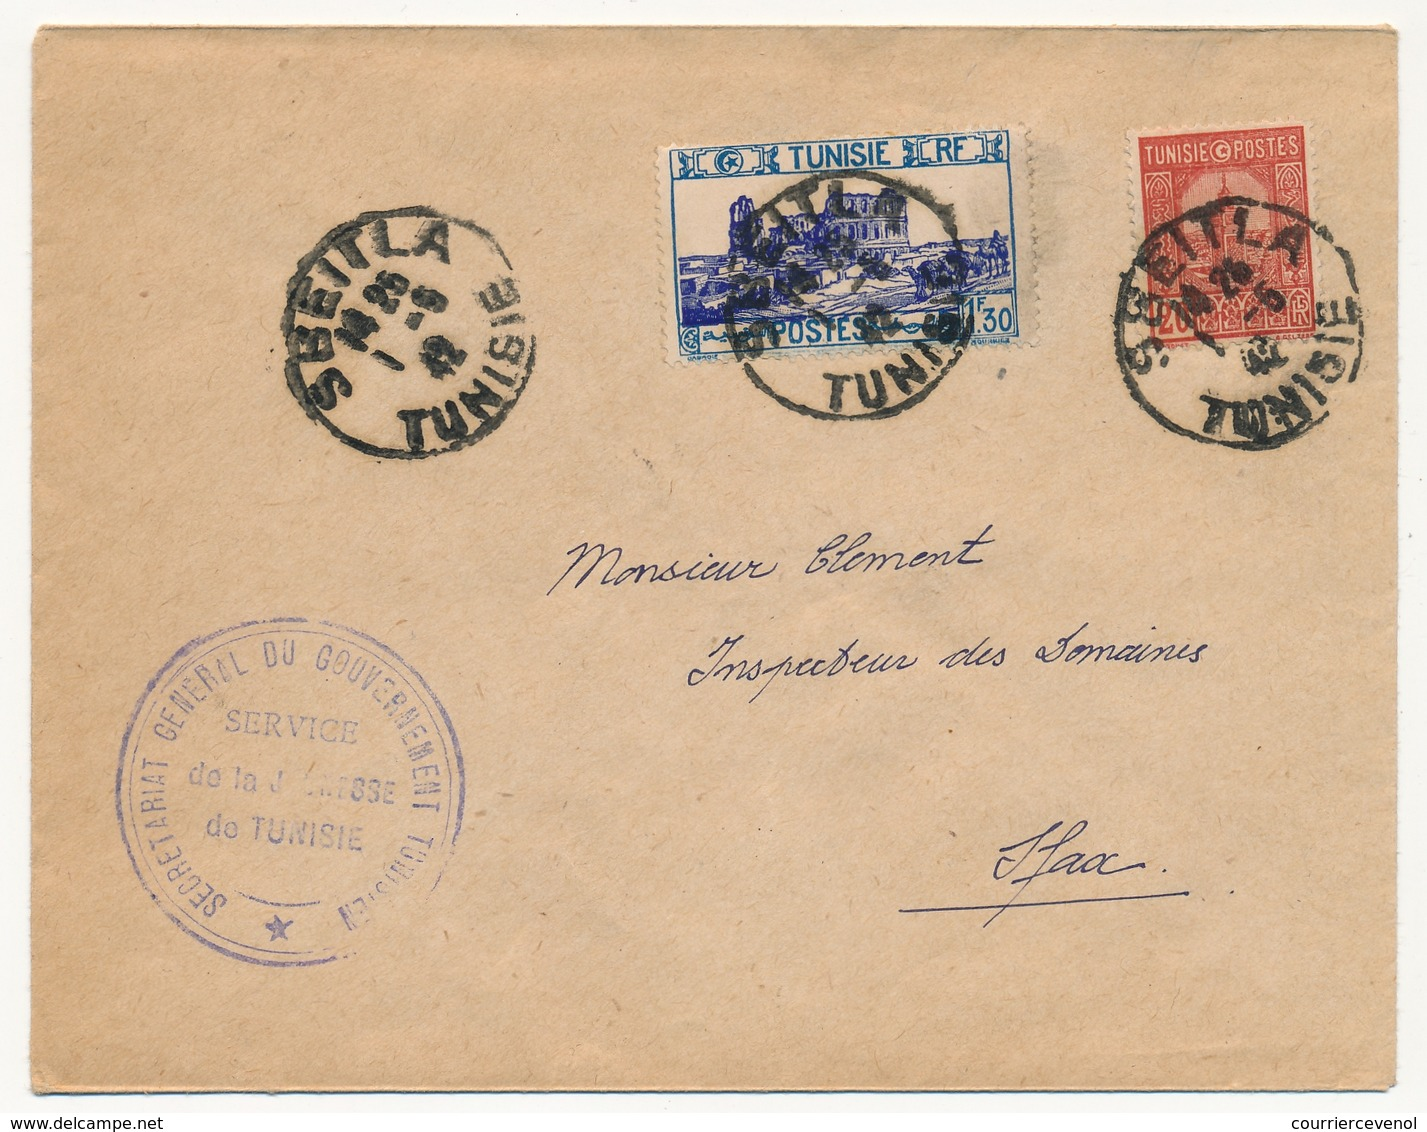 TUNISIE - Enveloppe Depuis SBEITLA (Tunisie) 1942 - Service De La Jeunesse De Tunisie - Tunisie (1888-1955)